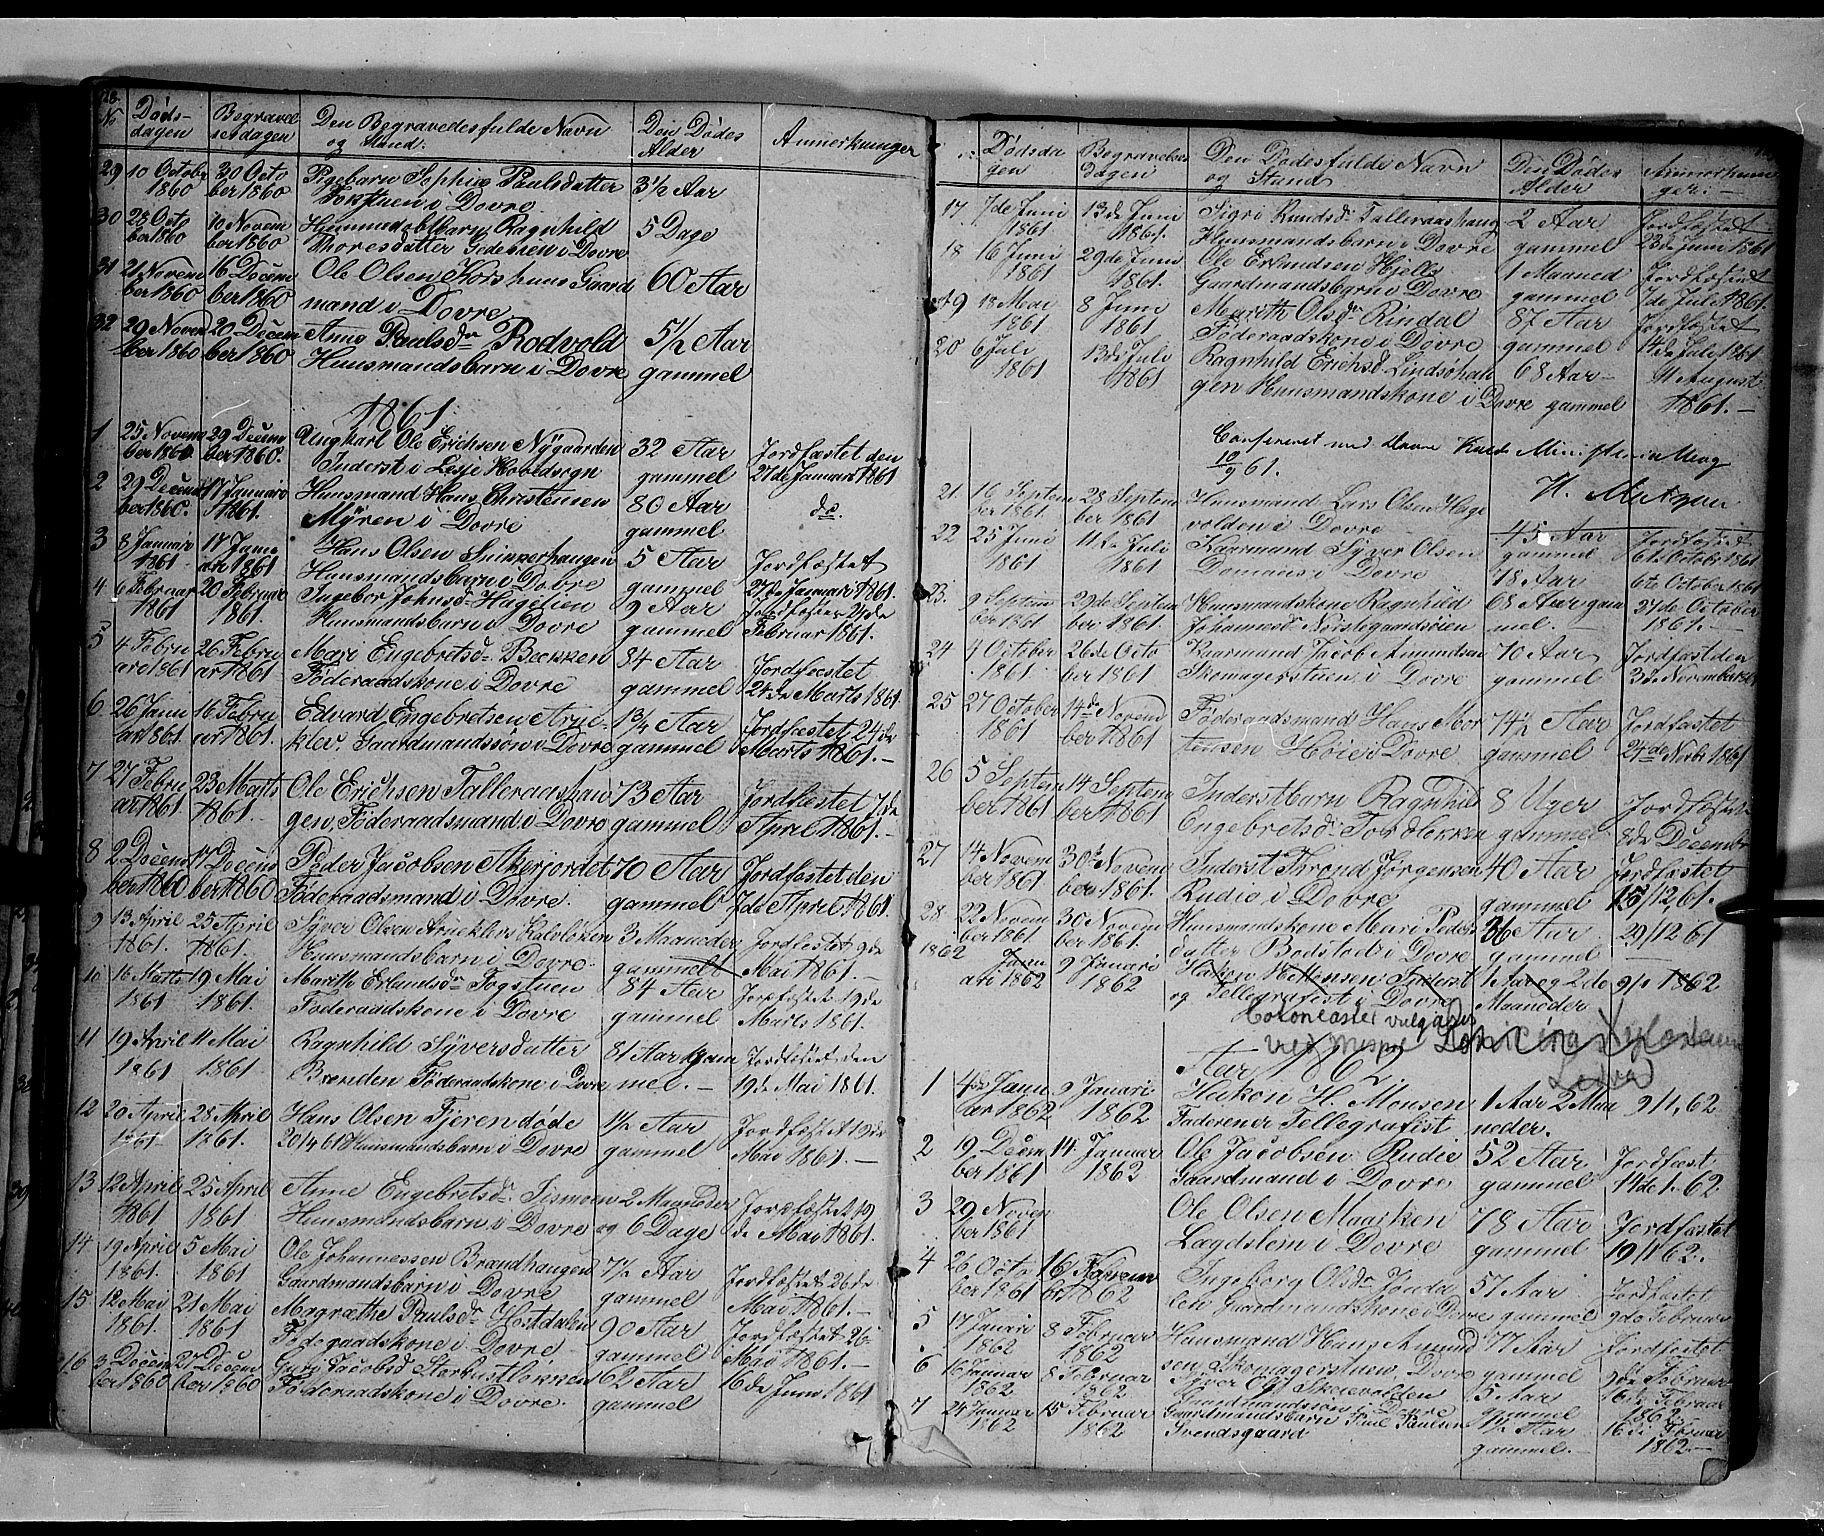 SAH, Lesja prestekontor, Klokkerbok nr. 3, 1842-1862, s. 128-129